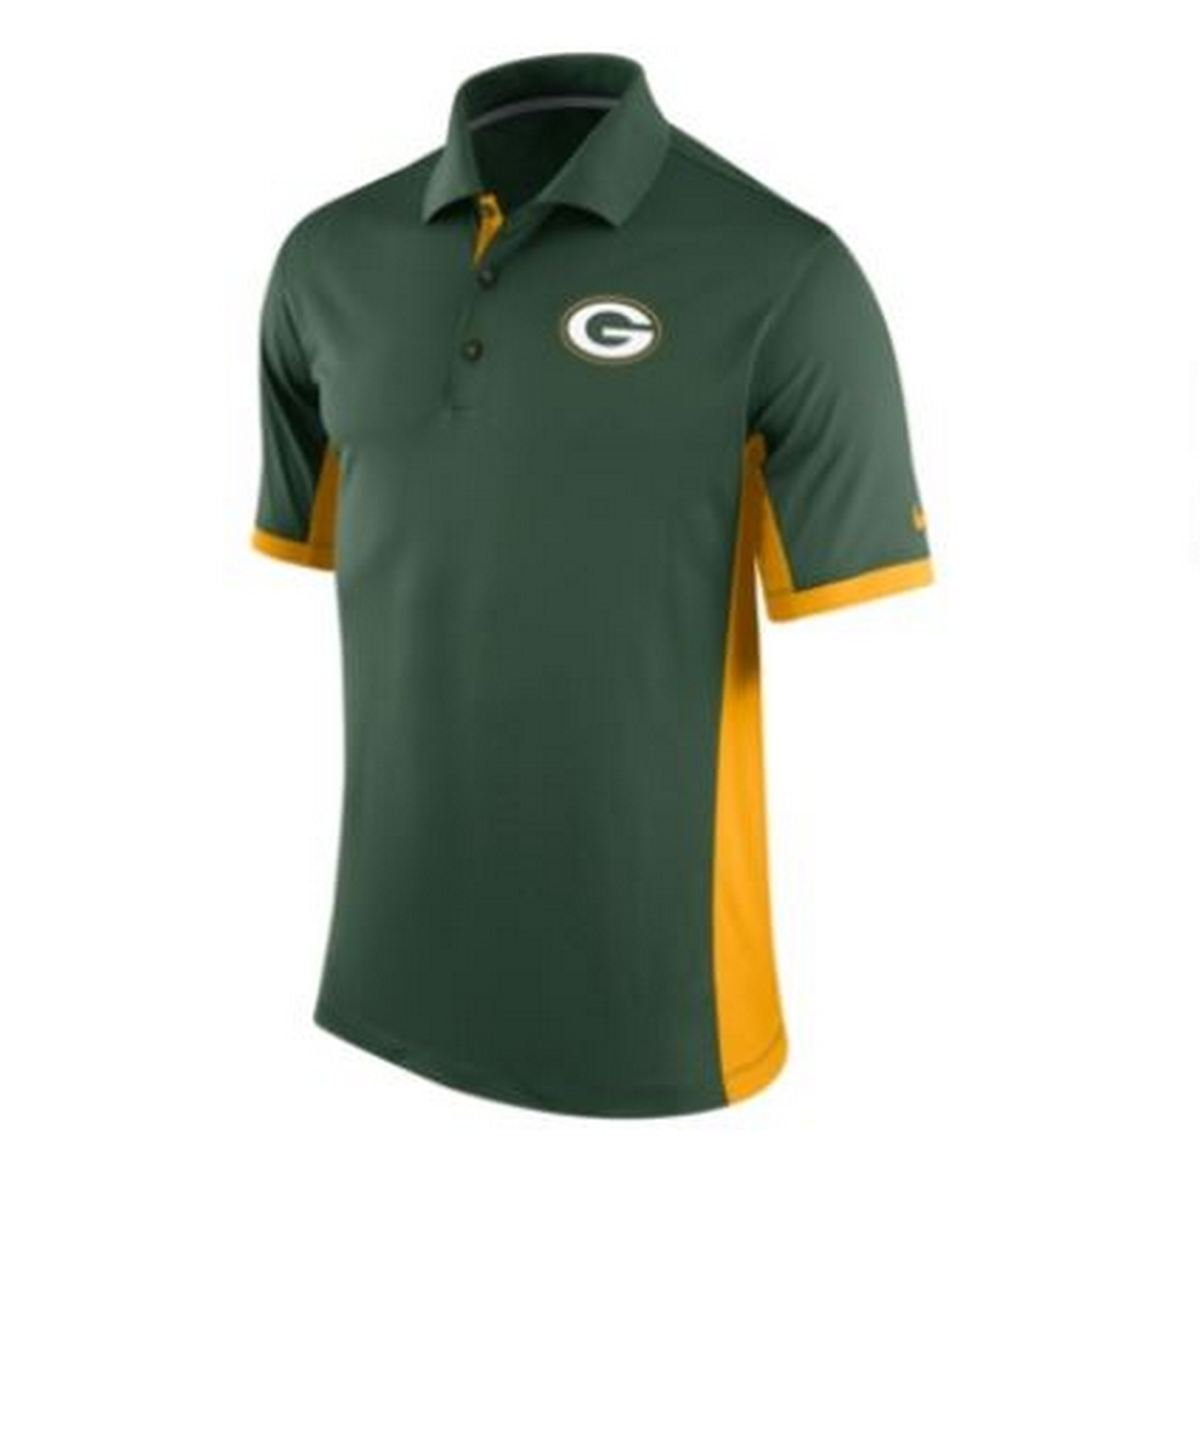 Nwt Nike Mens Green Bay Packers Dri Fit Team Issue Polo Sz S 657557